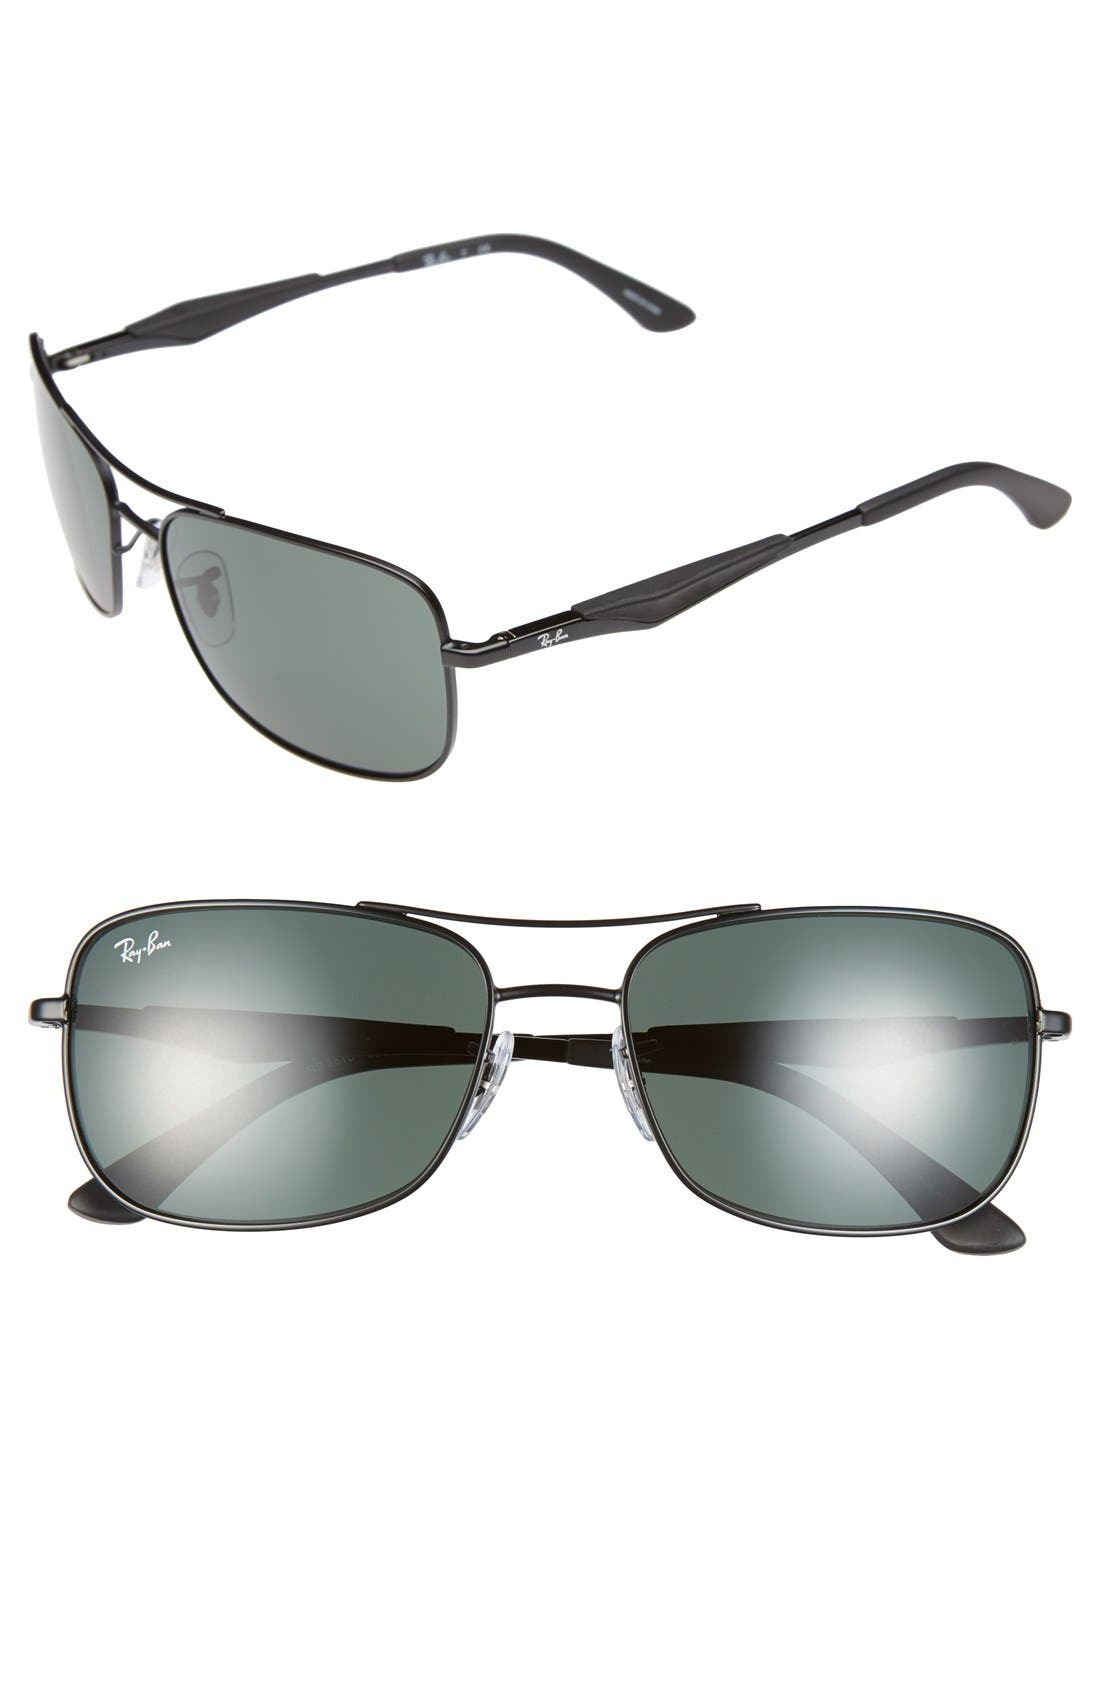 Main Image - Ray-Ban 58mm Steel Aviator Sunglasses